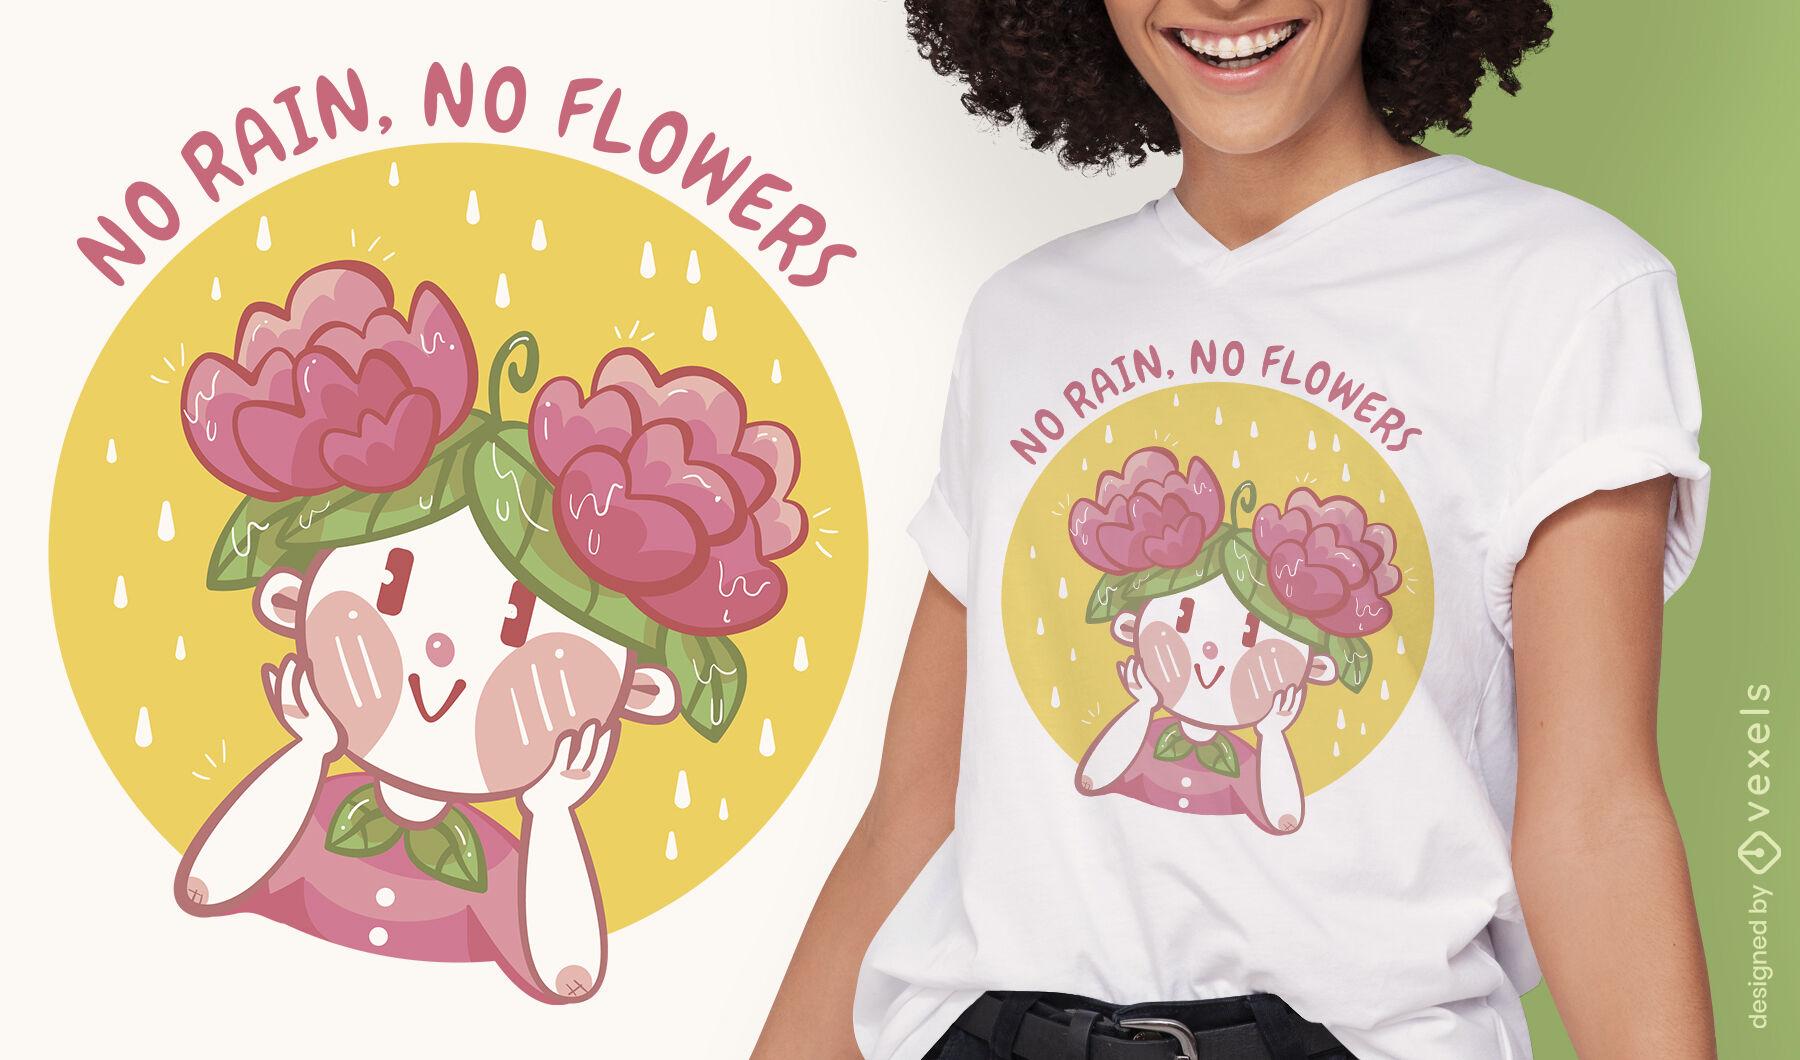 No flowers without rain t-shirt design